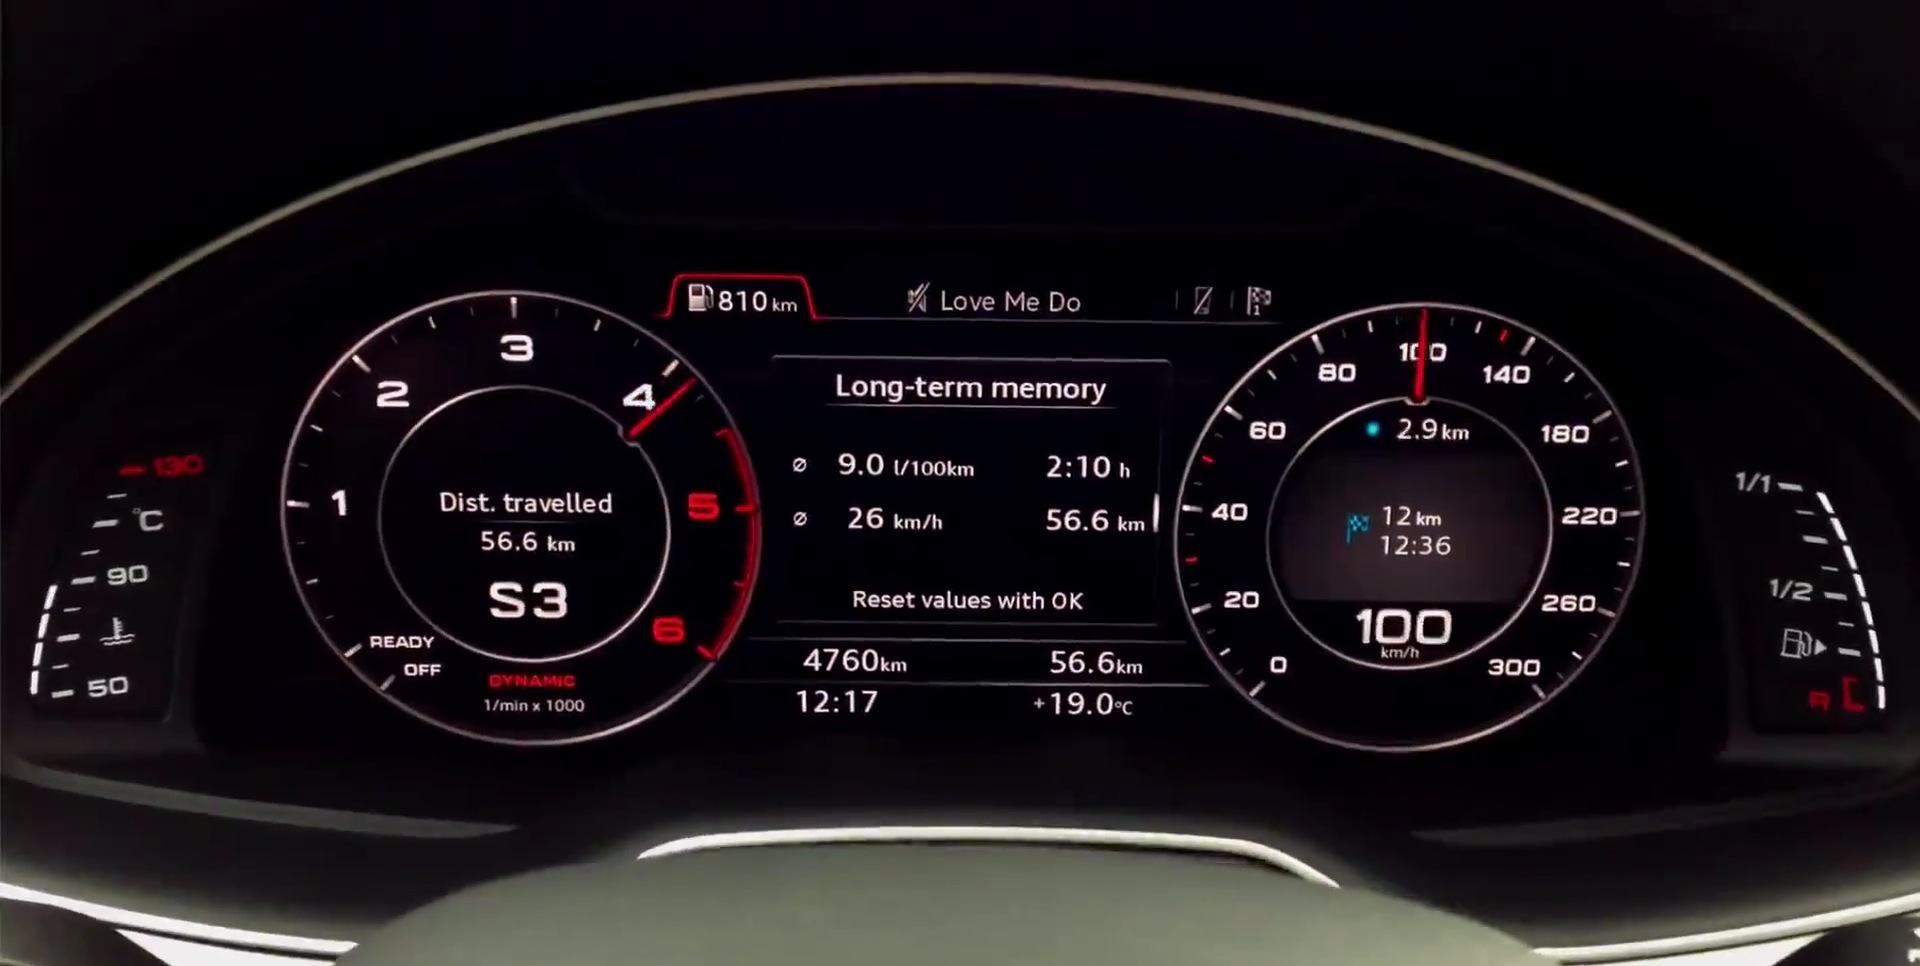 2016 Audi Q7 3 0 Tdi 218 Hp Acceleration Test Slightly Sluggish